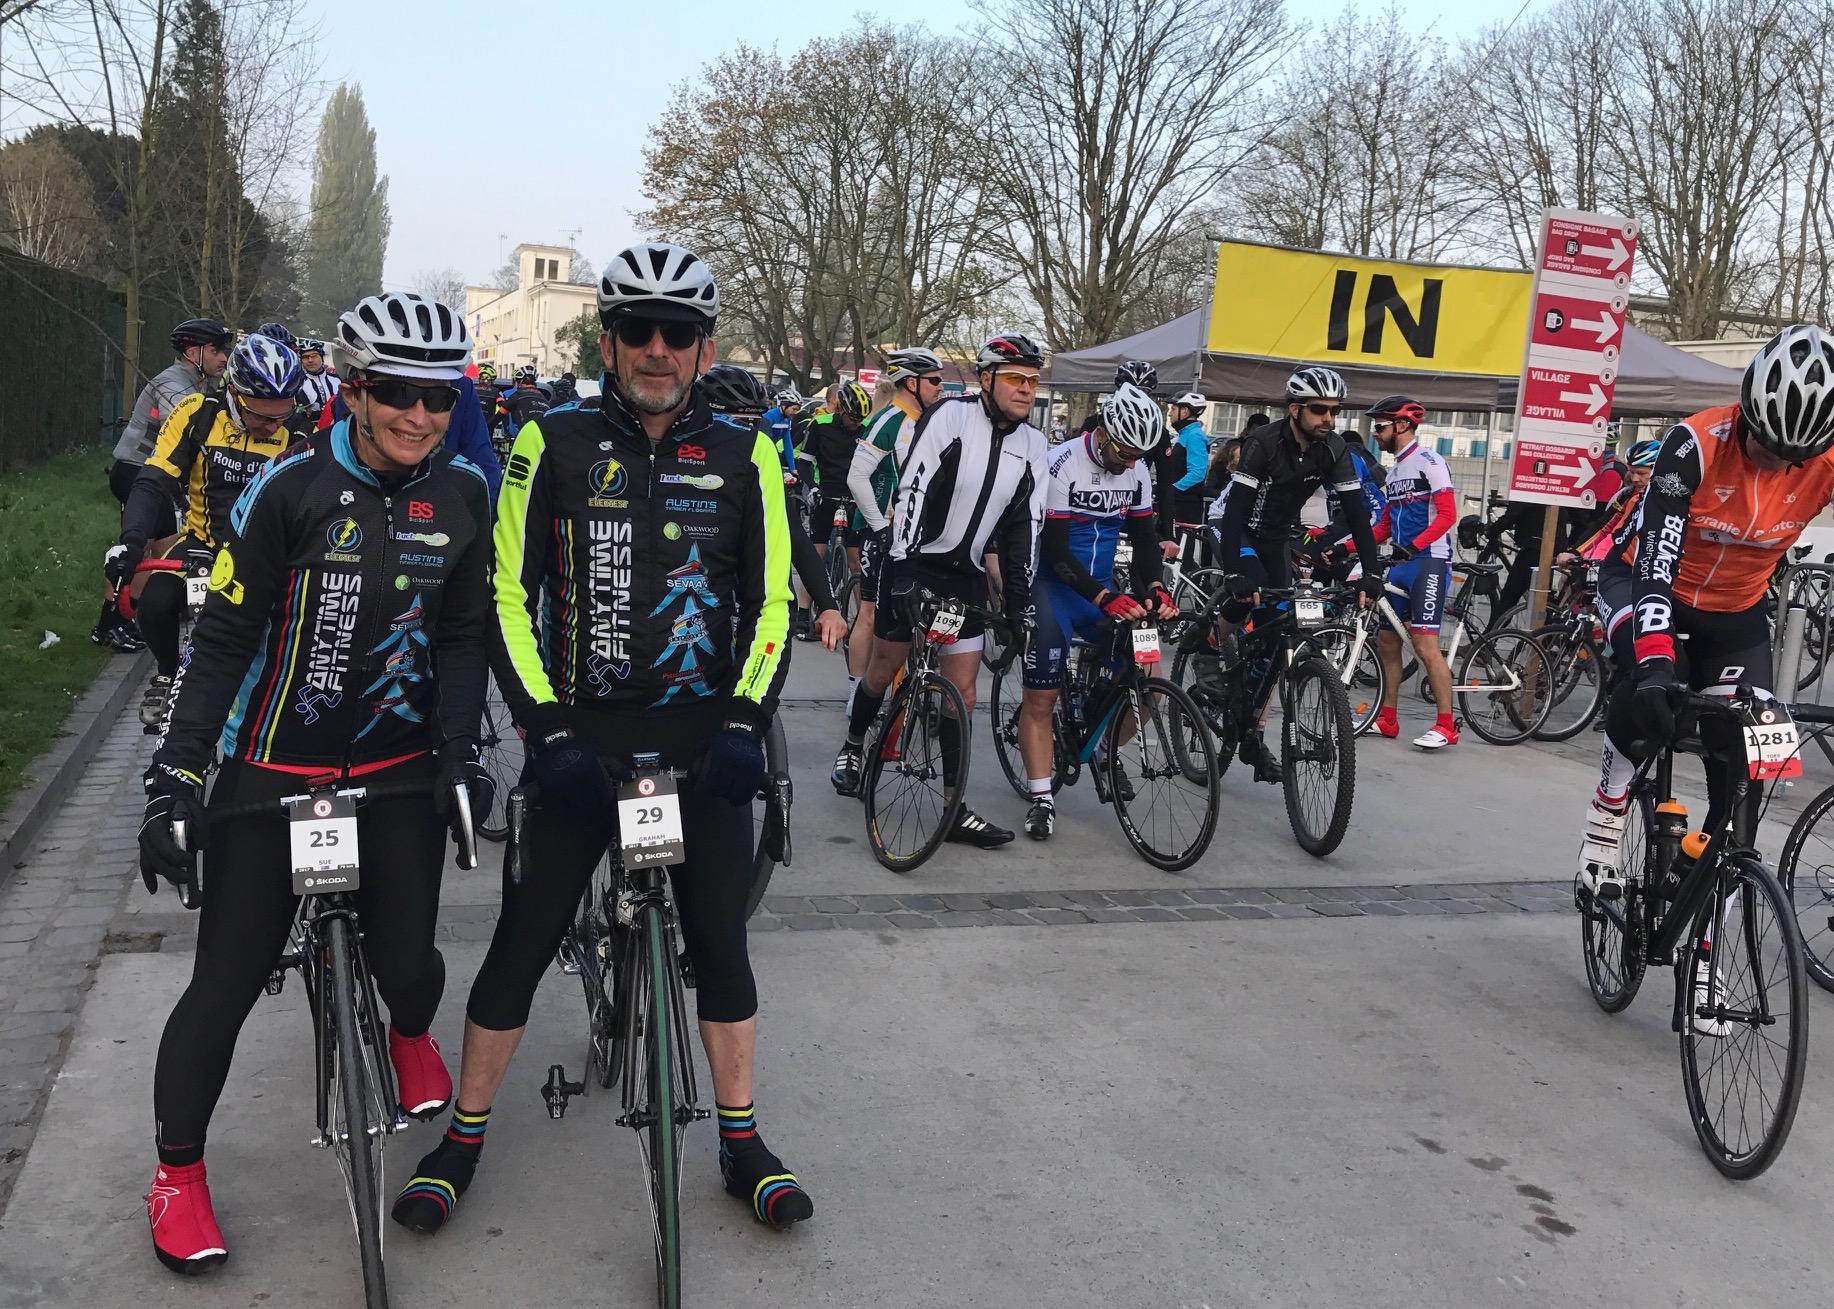 Paris Roubaix Cyclosportive 17 - at the start adjacent to the Roubaix Velodrome